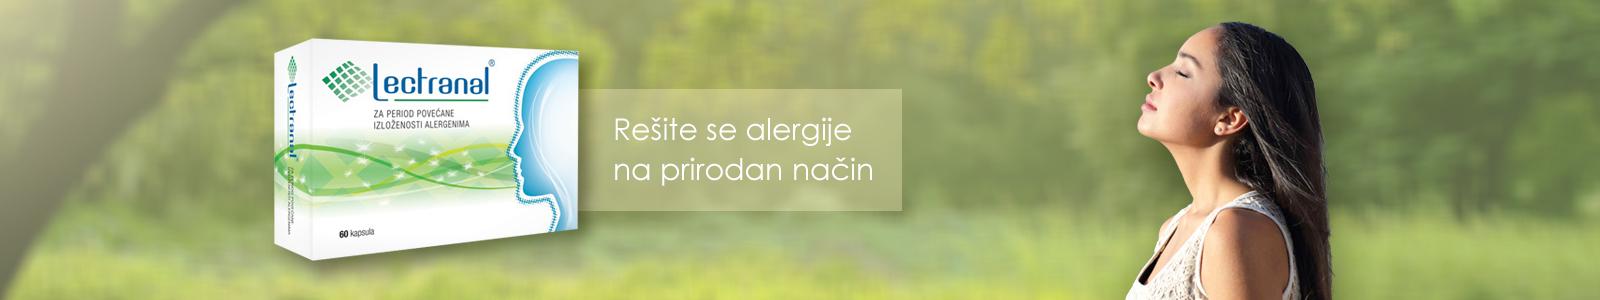 Alergije, imunitet i oporavak baner 1